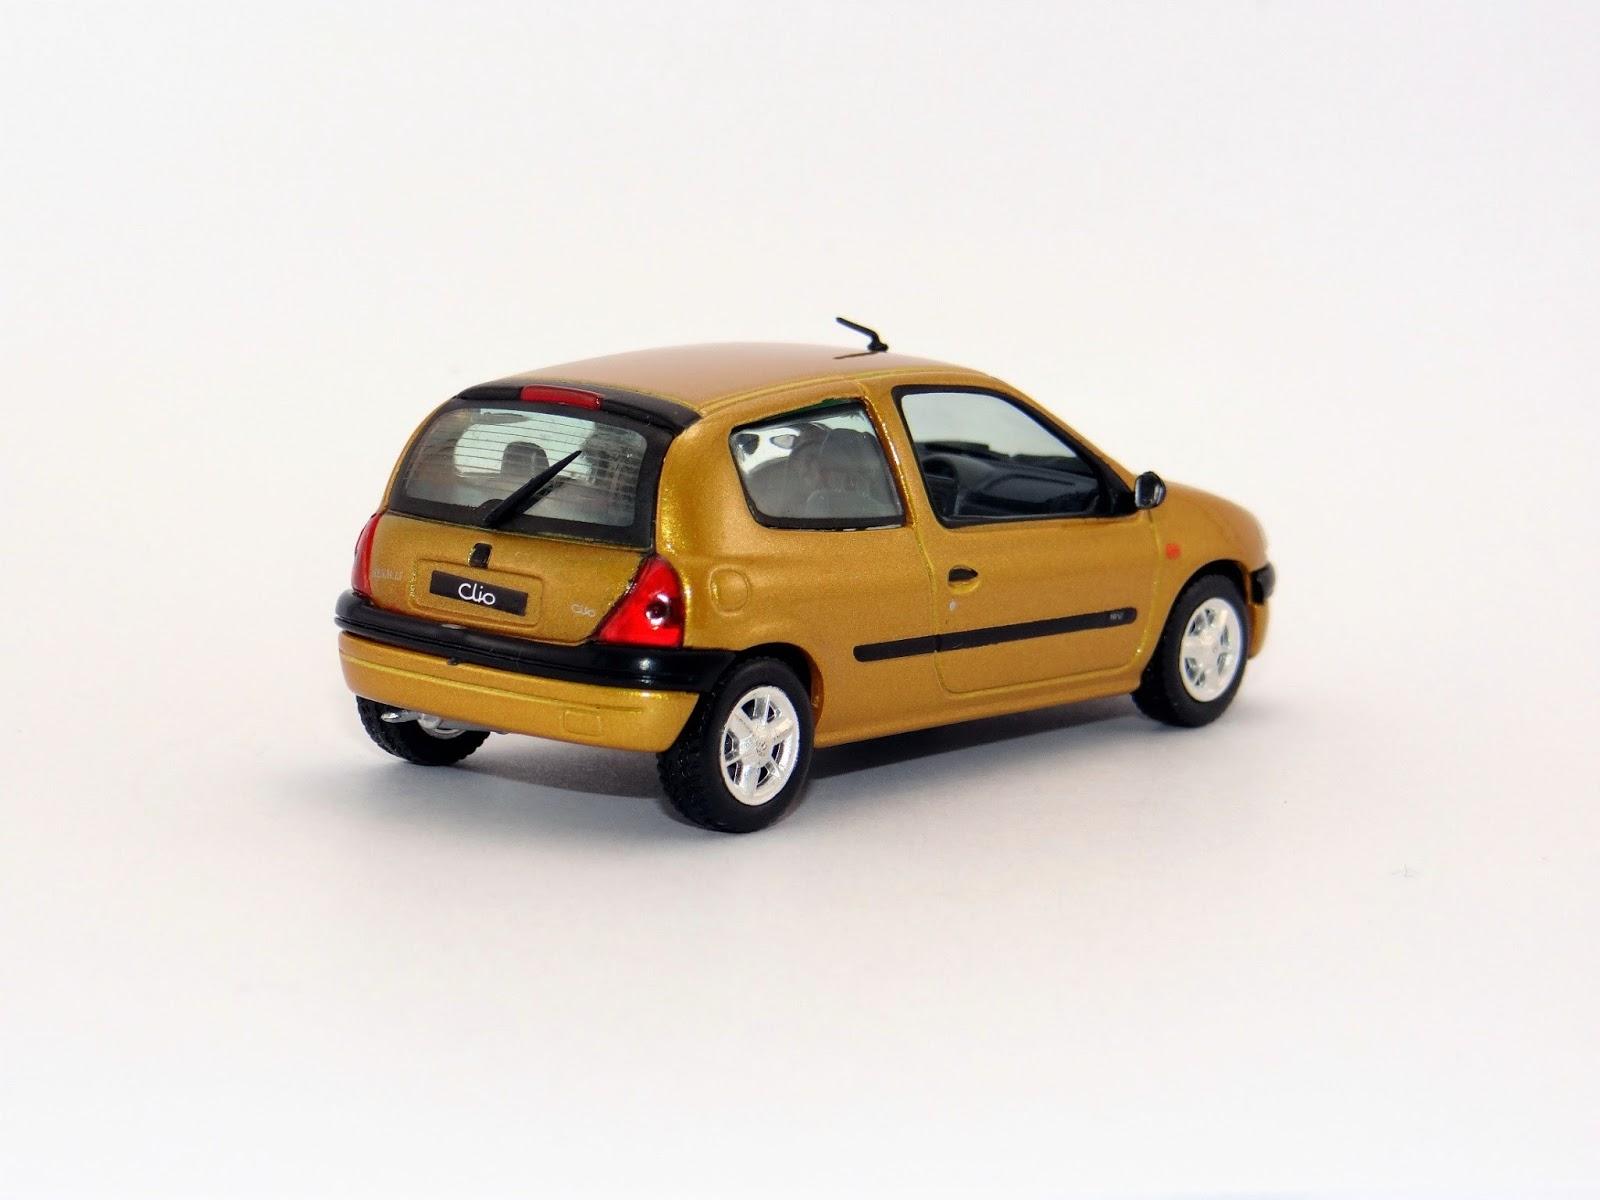 Renault Clio 1 file 1998 renault clio grande 1 2 wikimedia mons renault clio 1 2 image 5